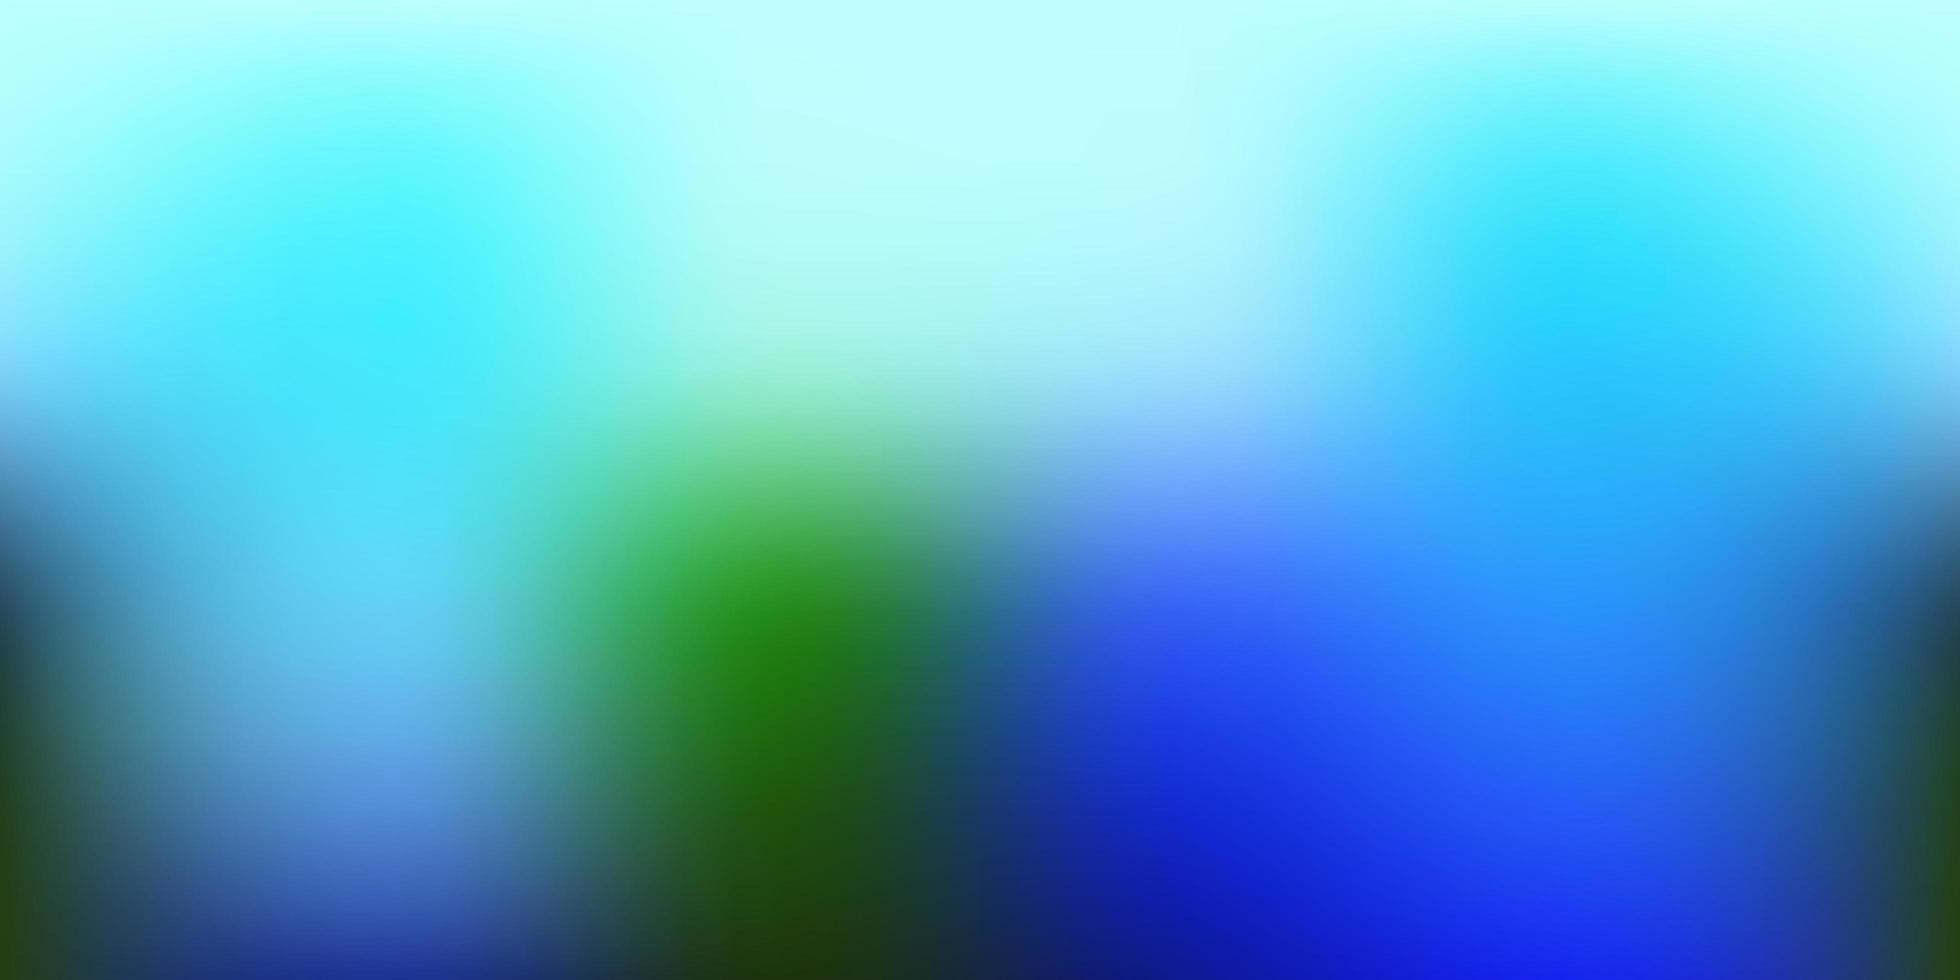 luz azul, verde vetor turva textura.